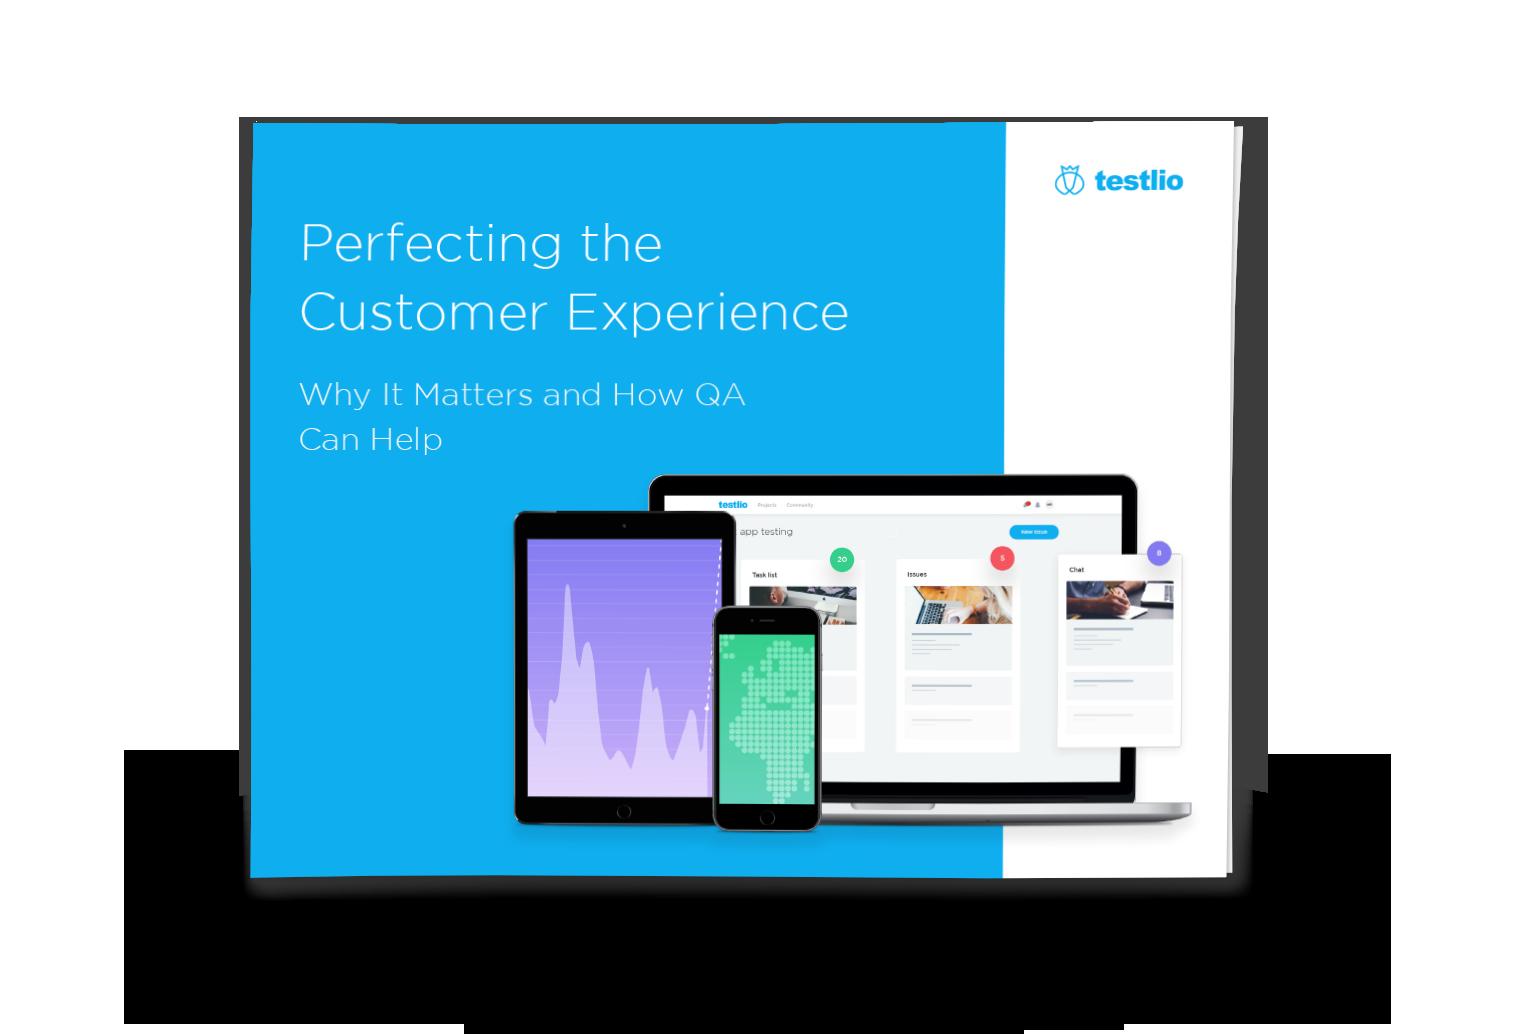 Testlio eBook Perfecting the Customer Experience through QA testing